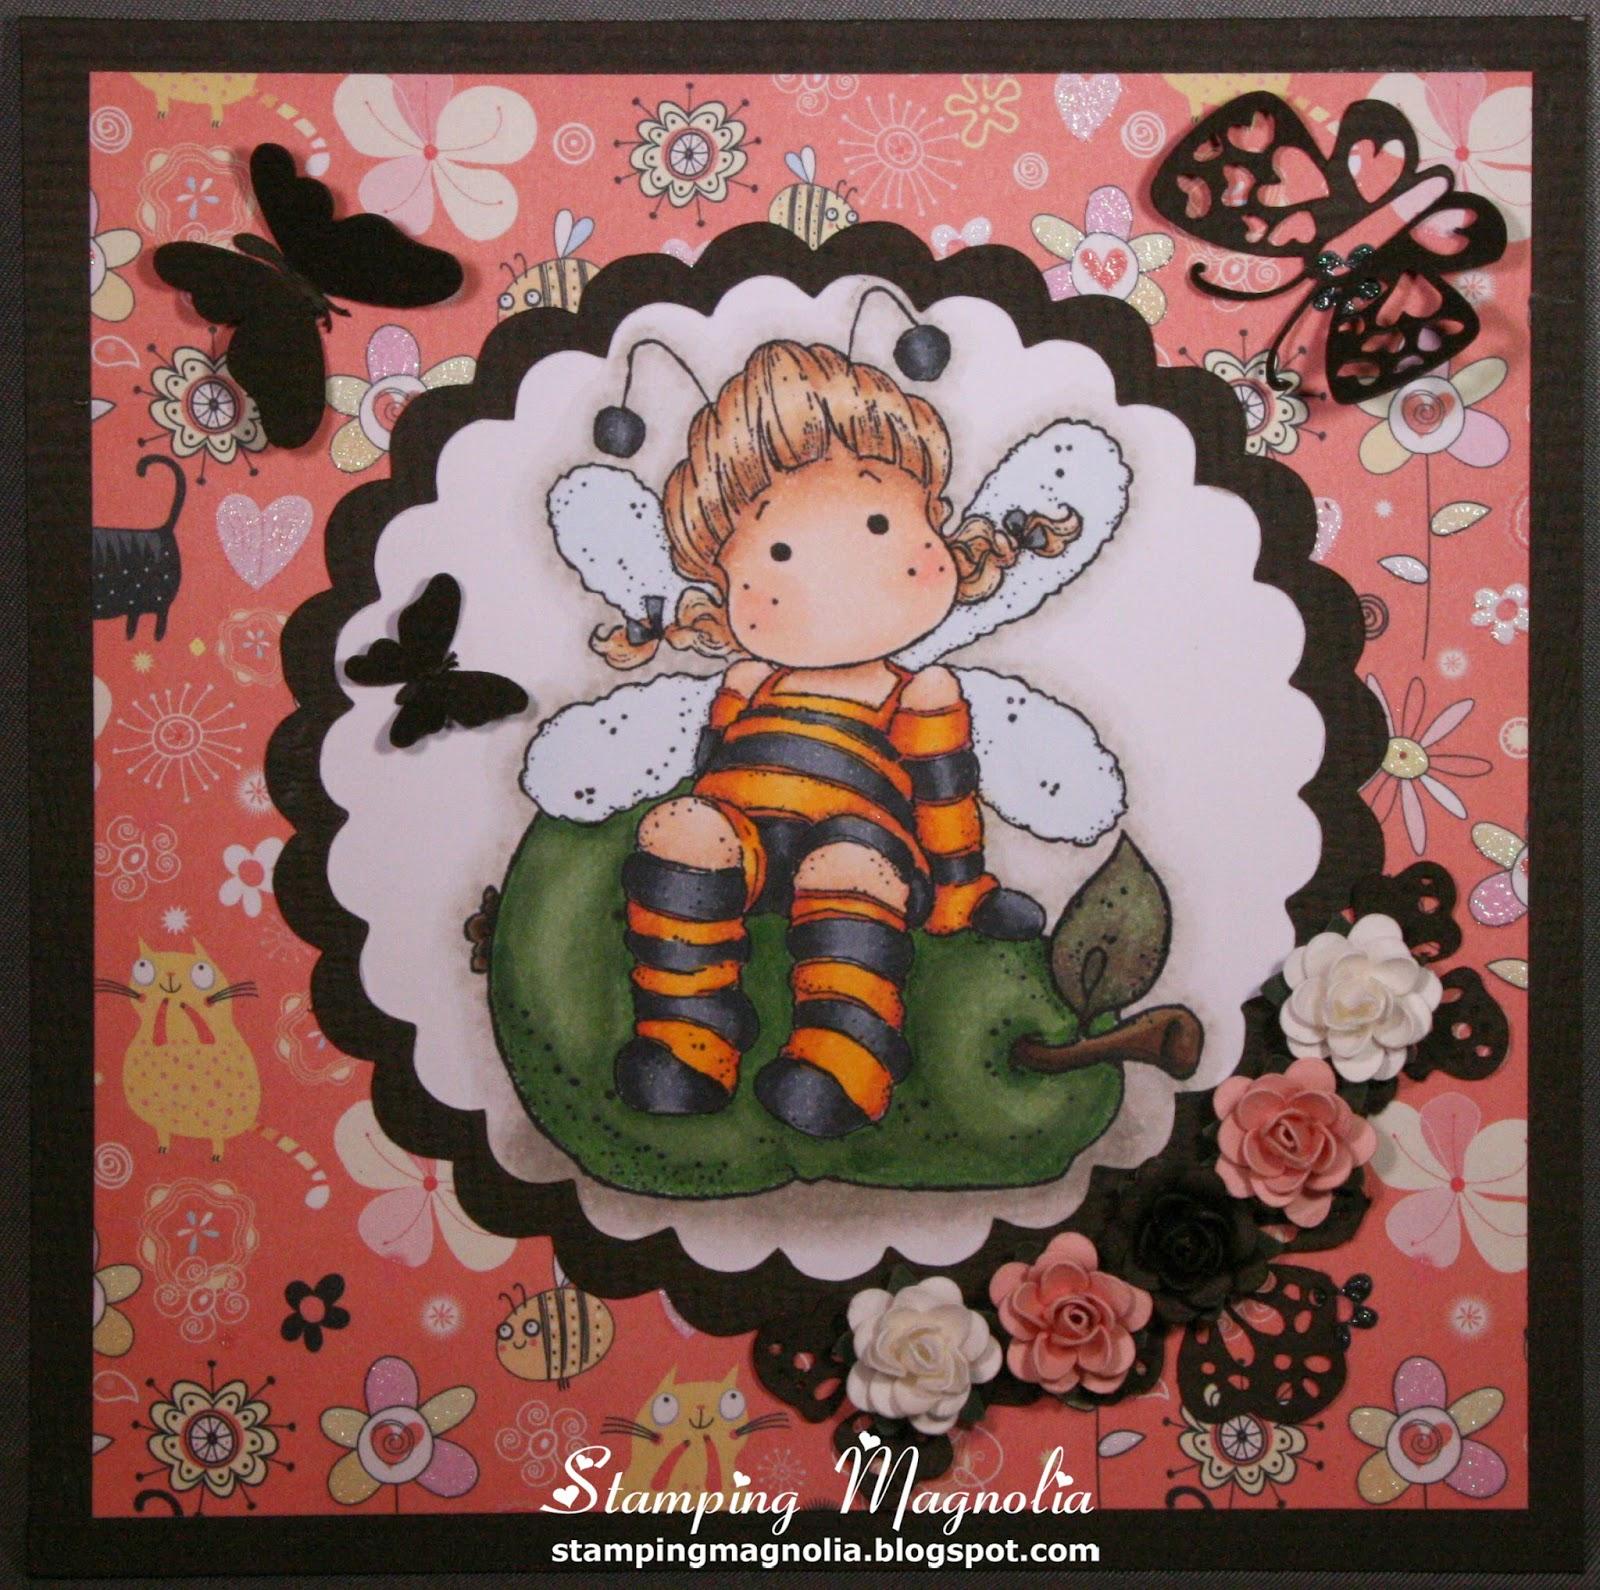 Coloring Magnolia Stamp Summer Memories Collection - Honey Bee Tilda